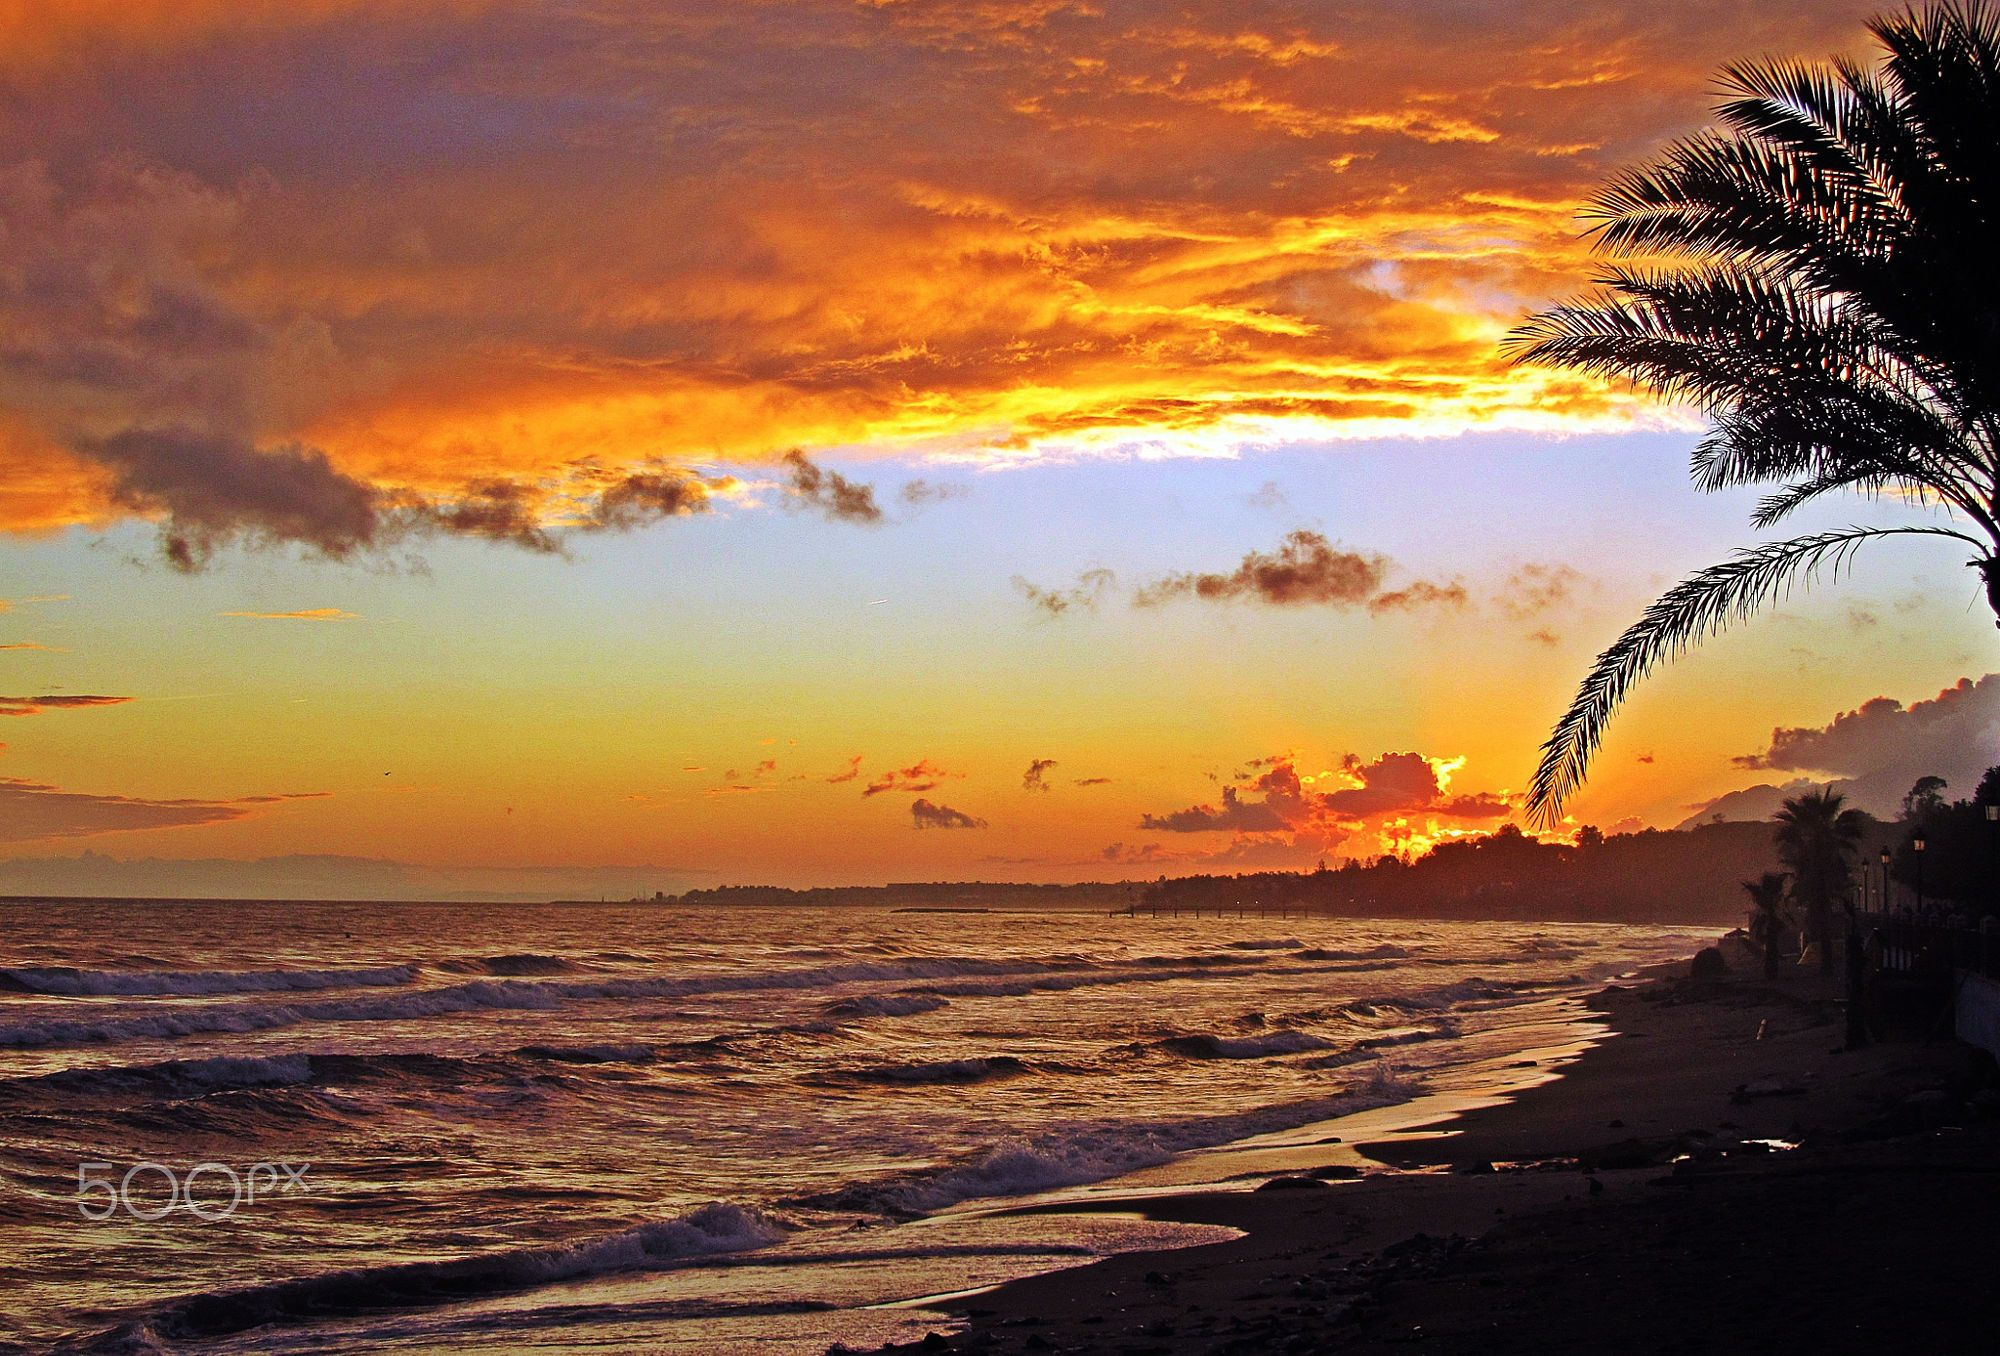 Puesta de sol  Landscapes photo by antonioc55 http://rarme.com/?F9gZi